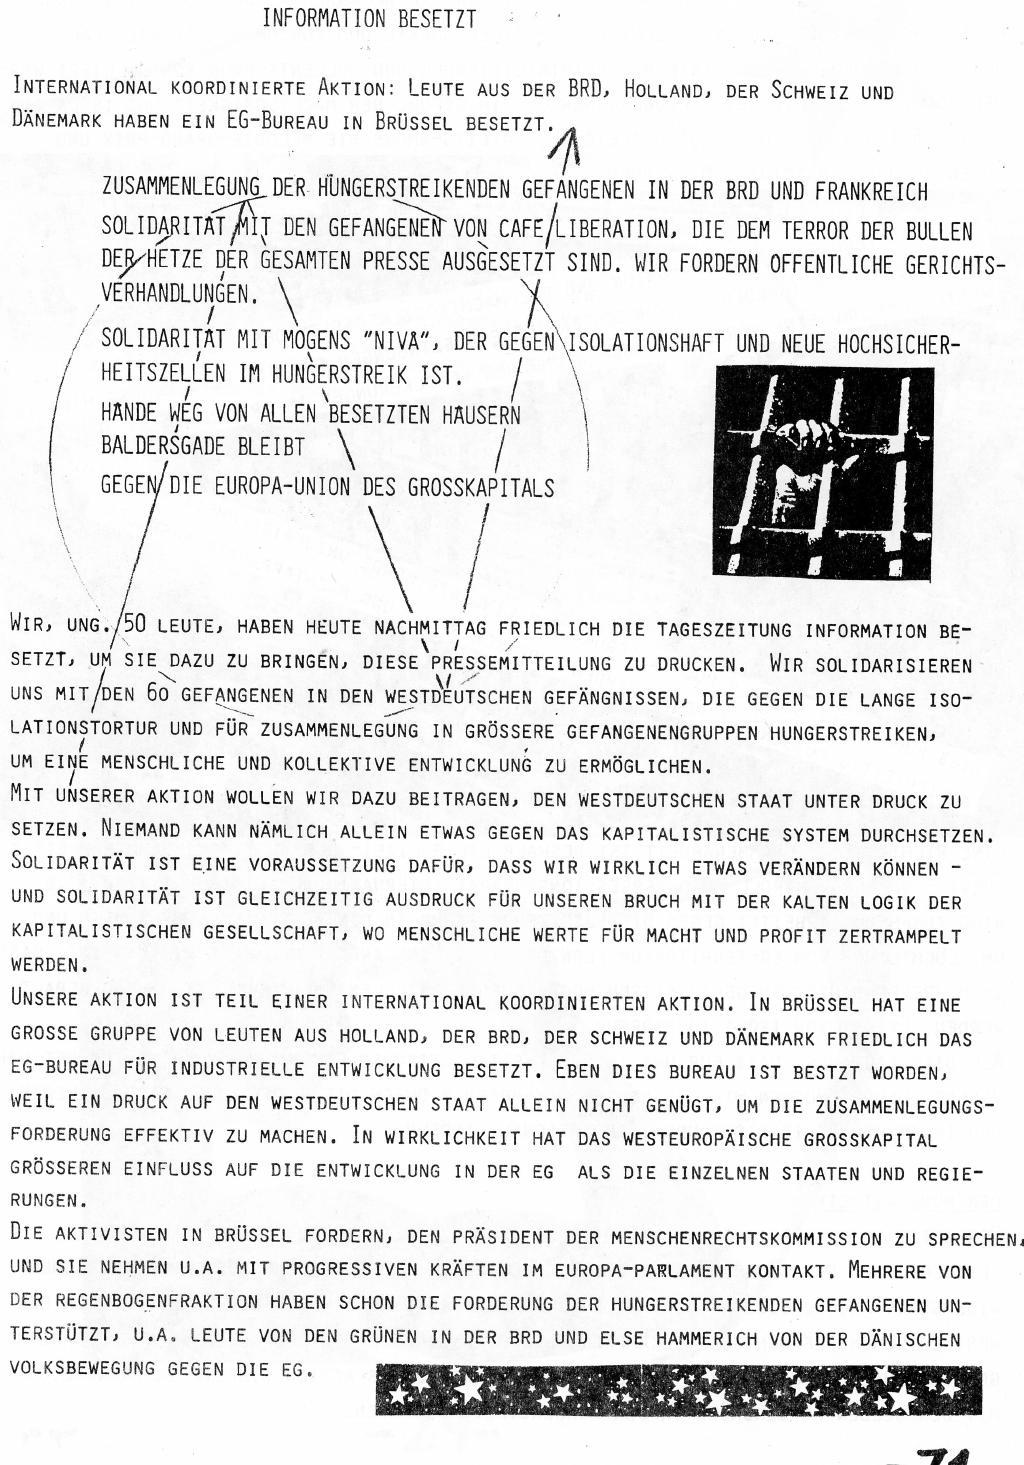 Belgien_Doku_Besetzung_EG_Kommission_1989_073